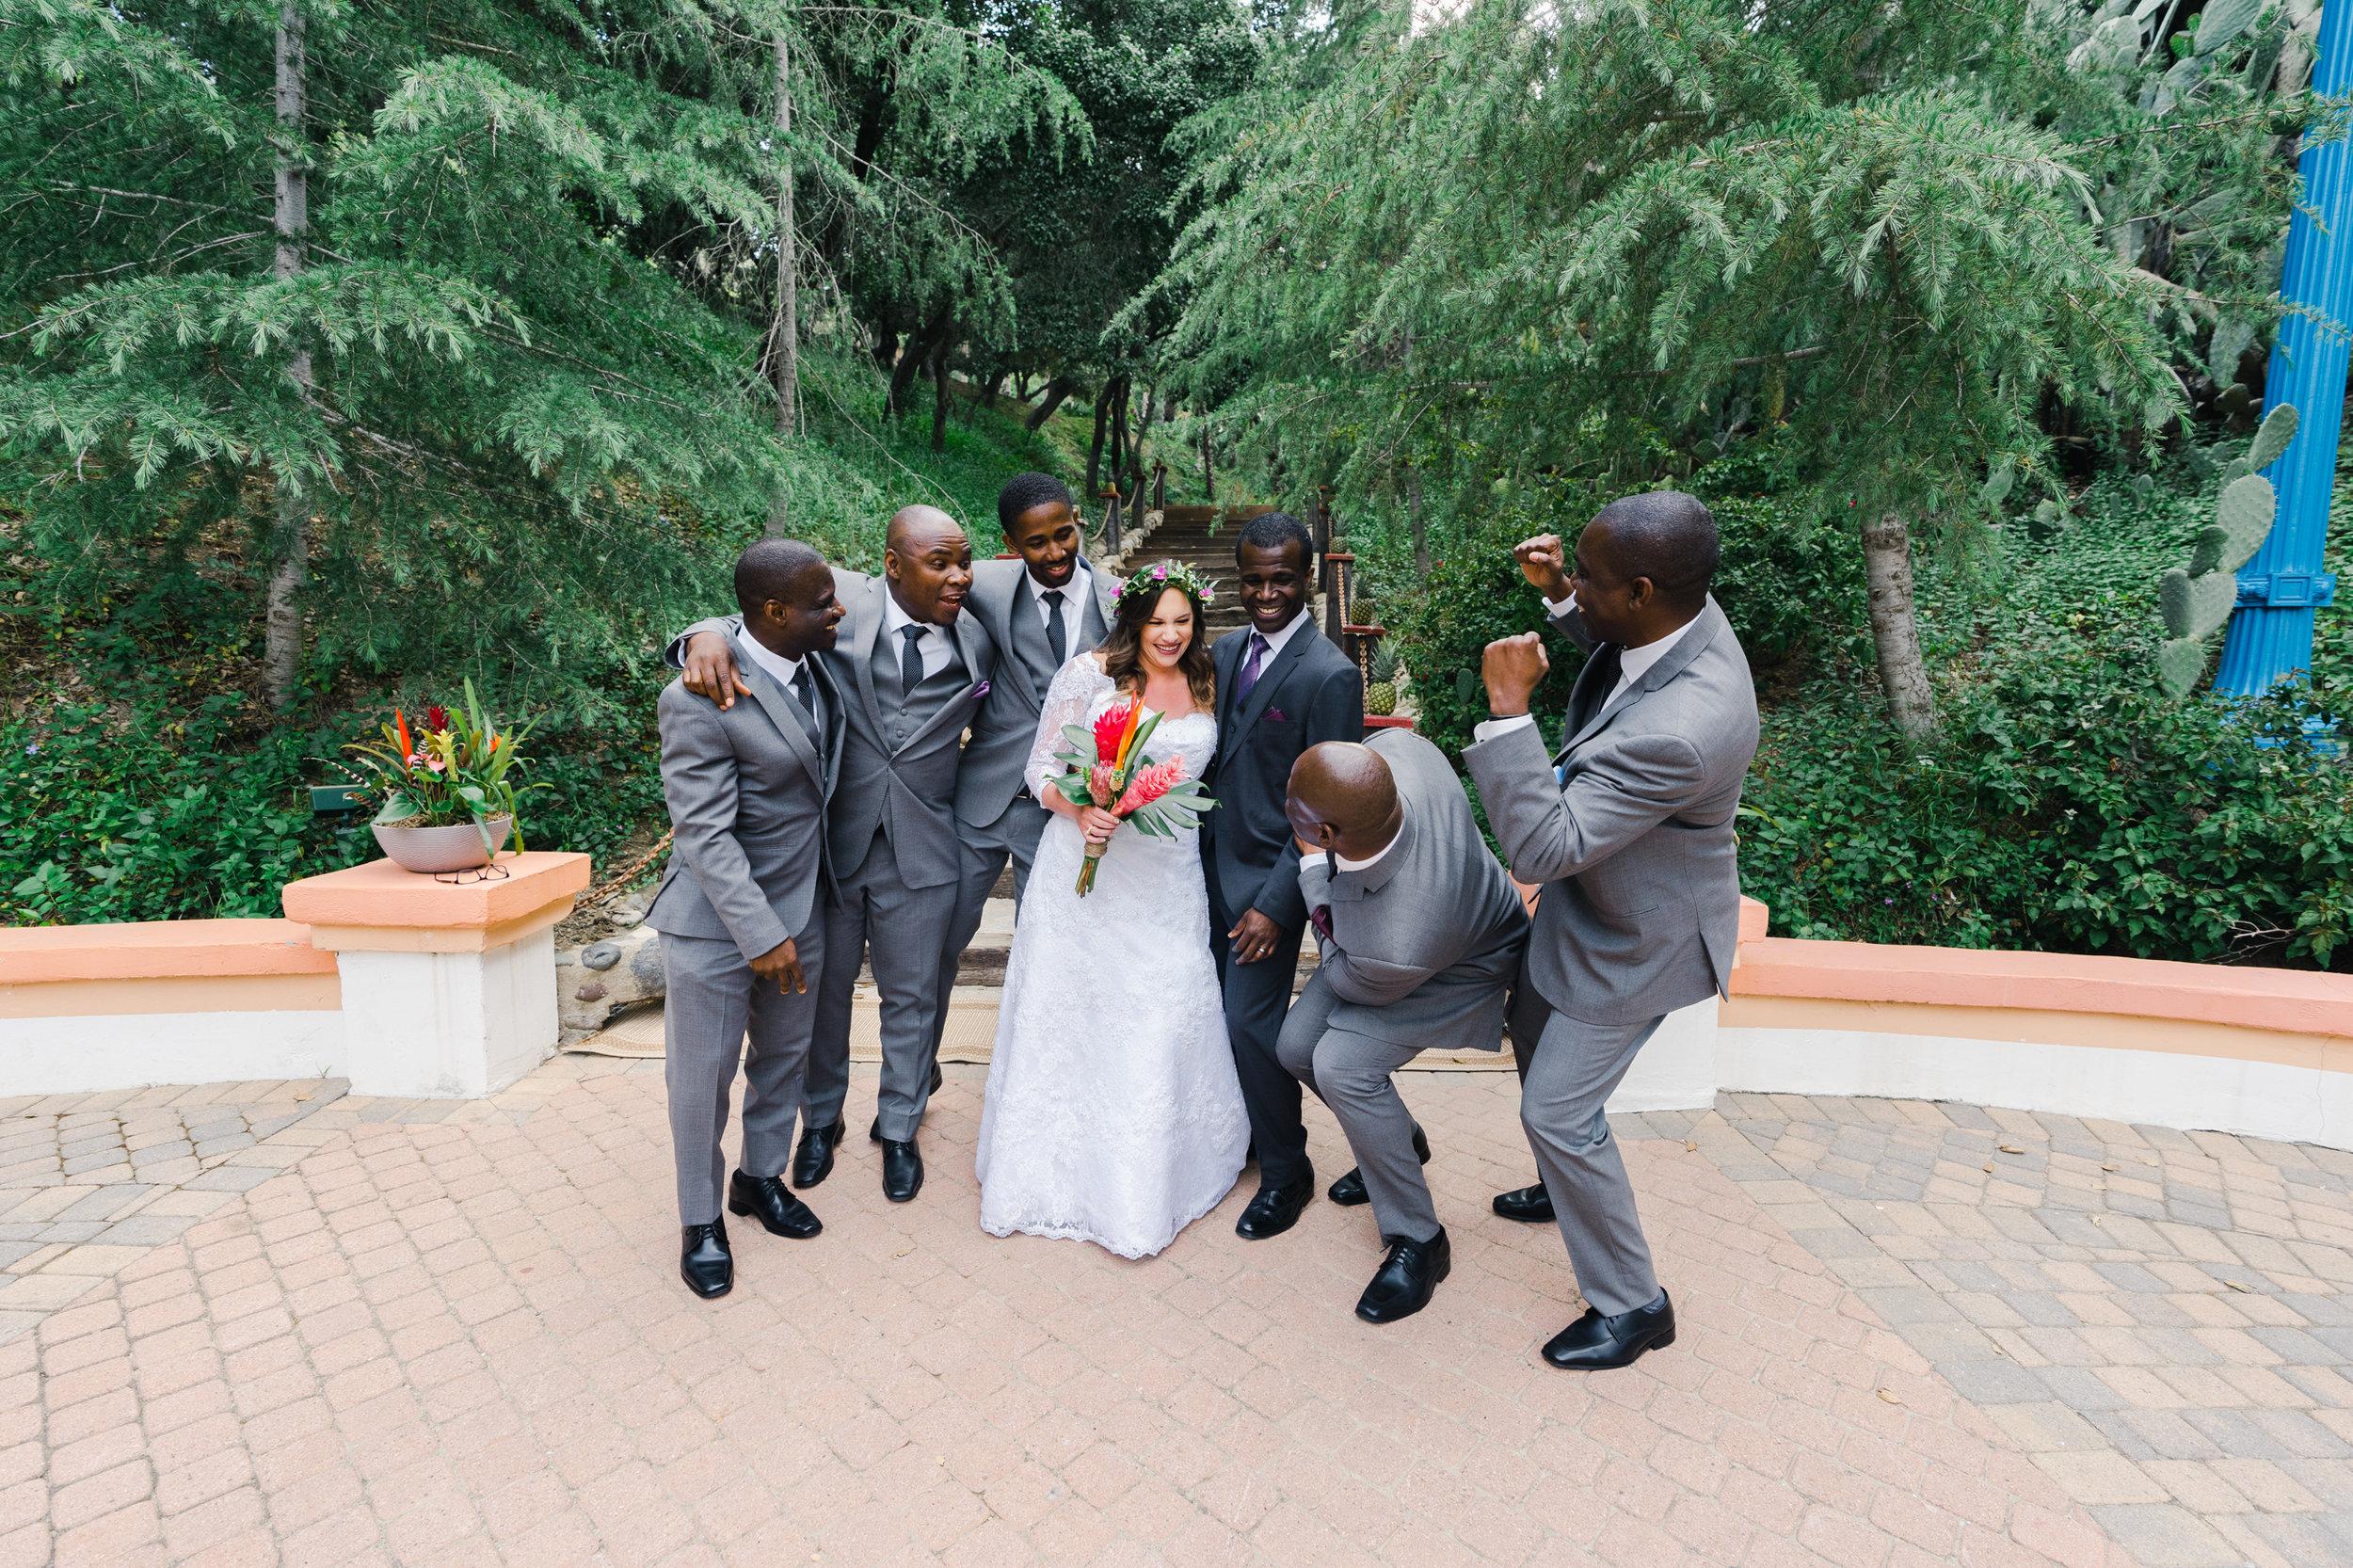 rancho-las-lomas-wedding-kelsey-sim_0148.JPG